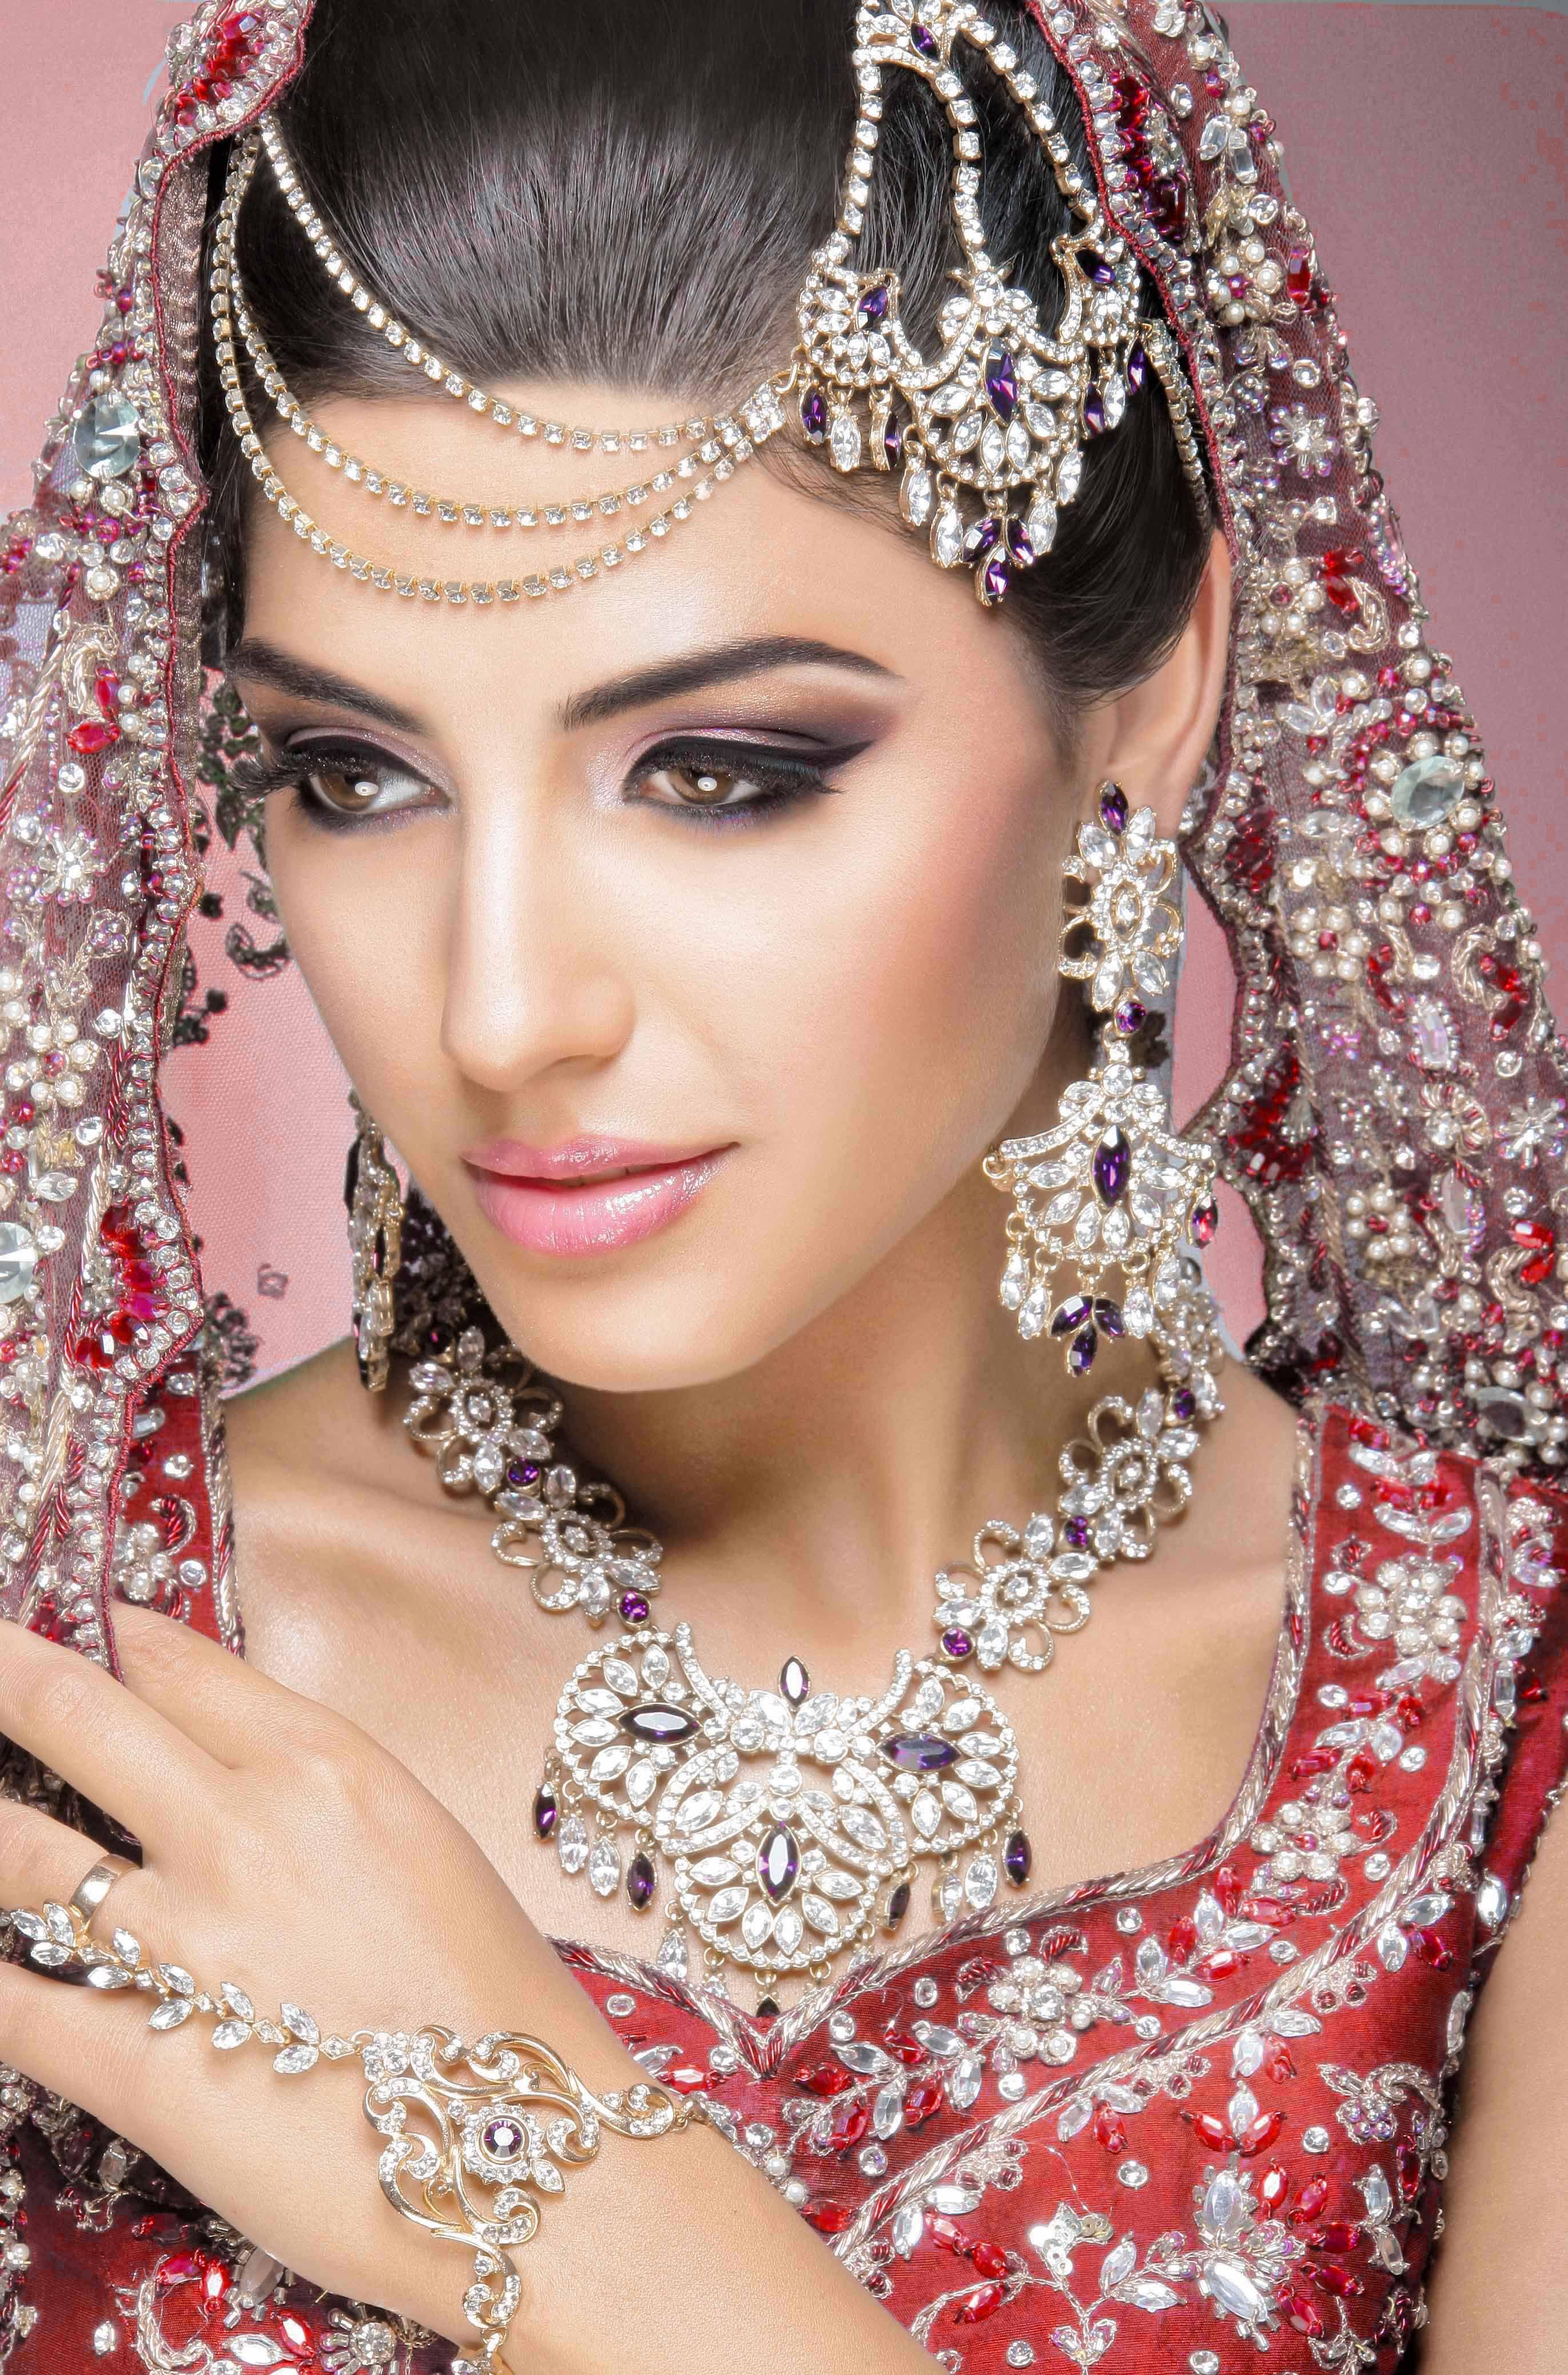 Statement Clutch - Diamond Ruby Indian Bride by VIDA VIDA mc8e0sV